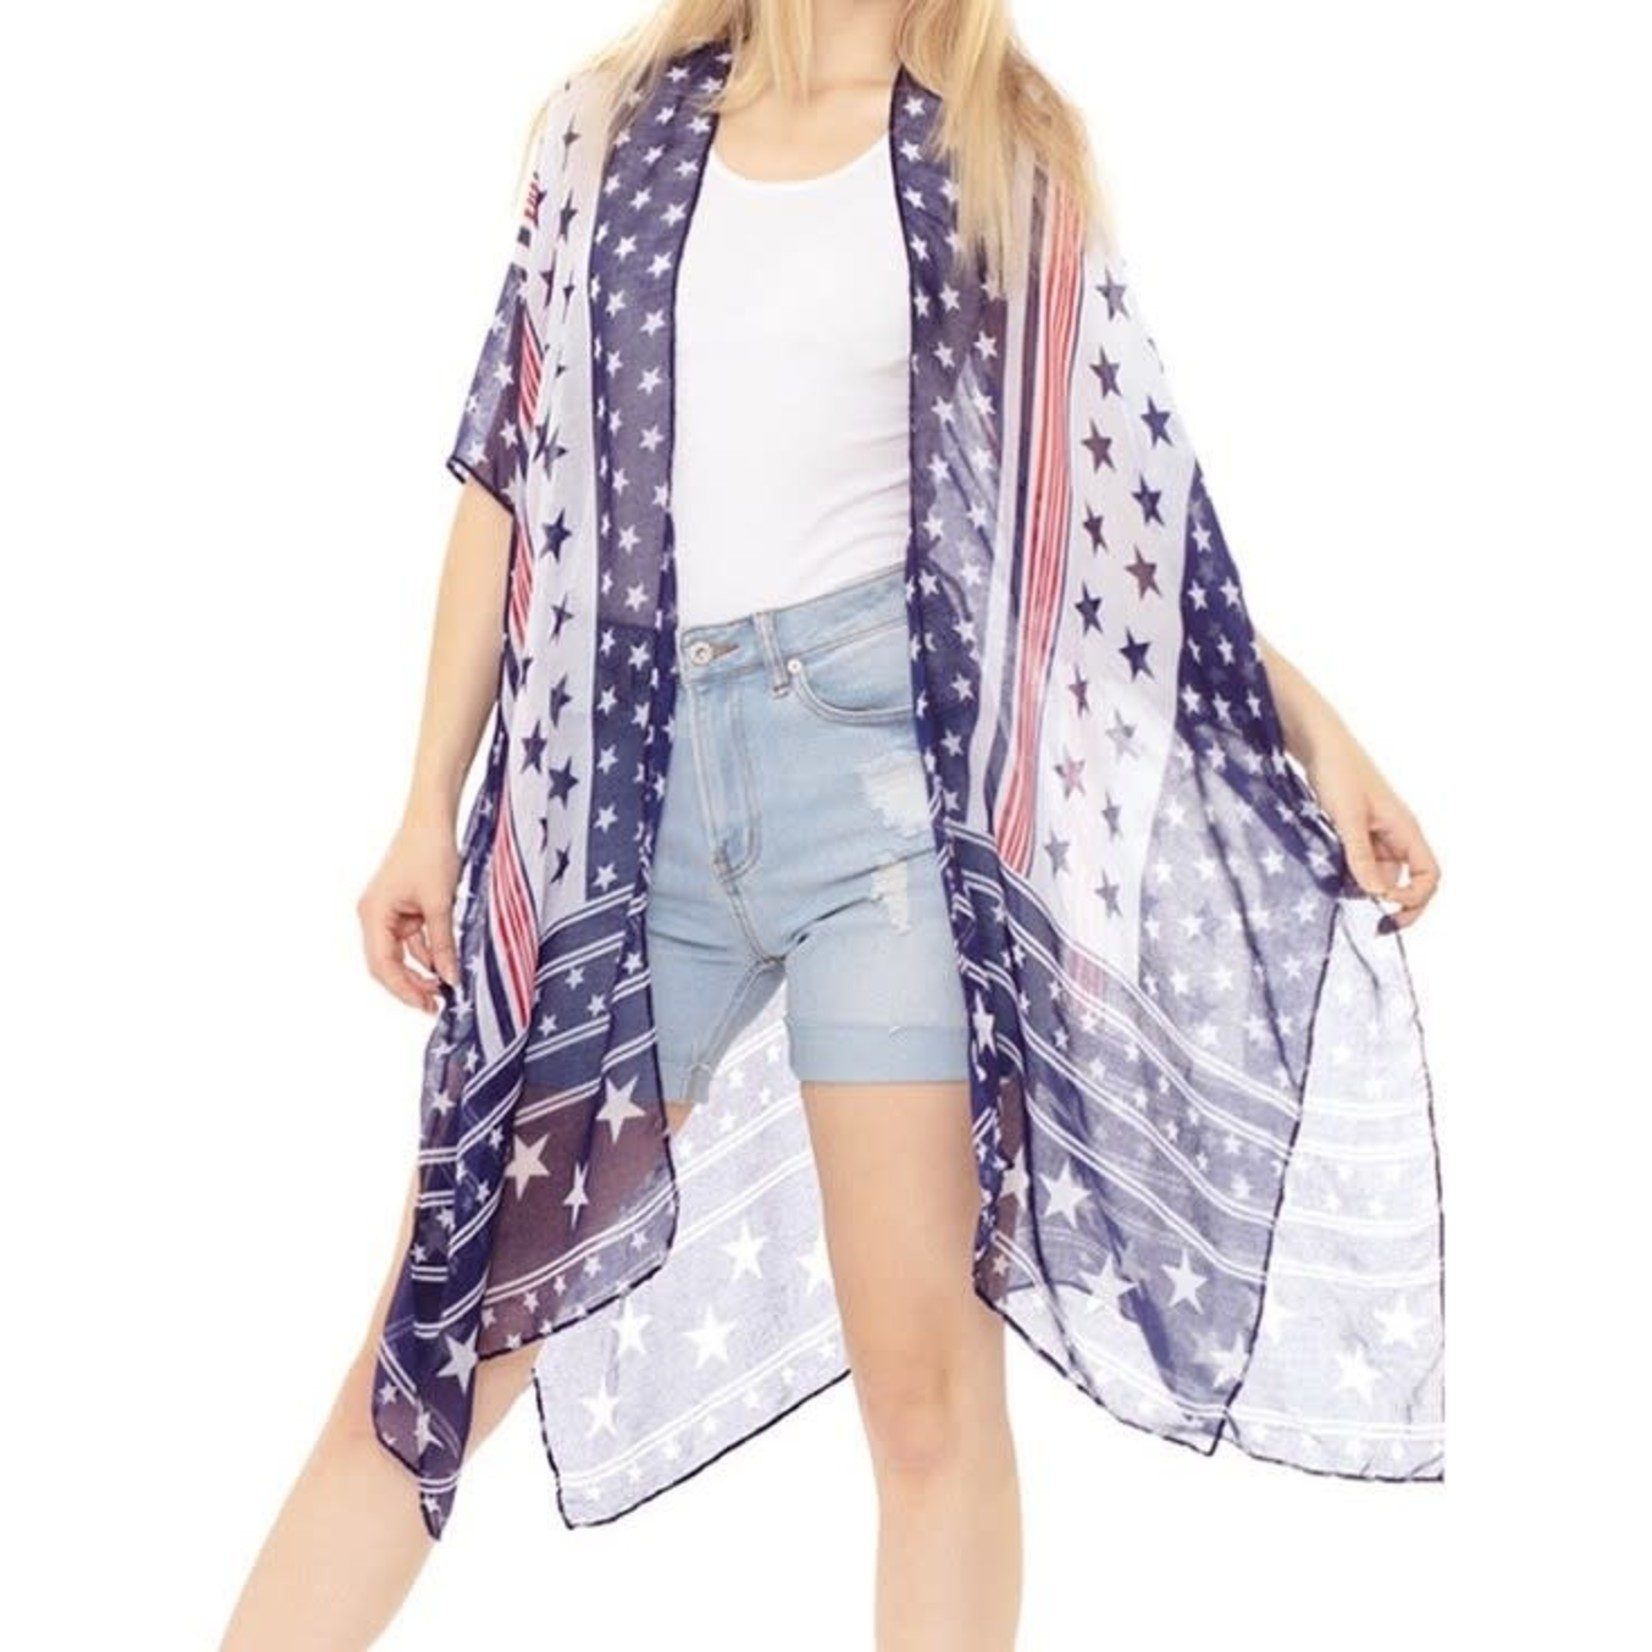 Hanna Hoisery Lightweight Kimonos: